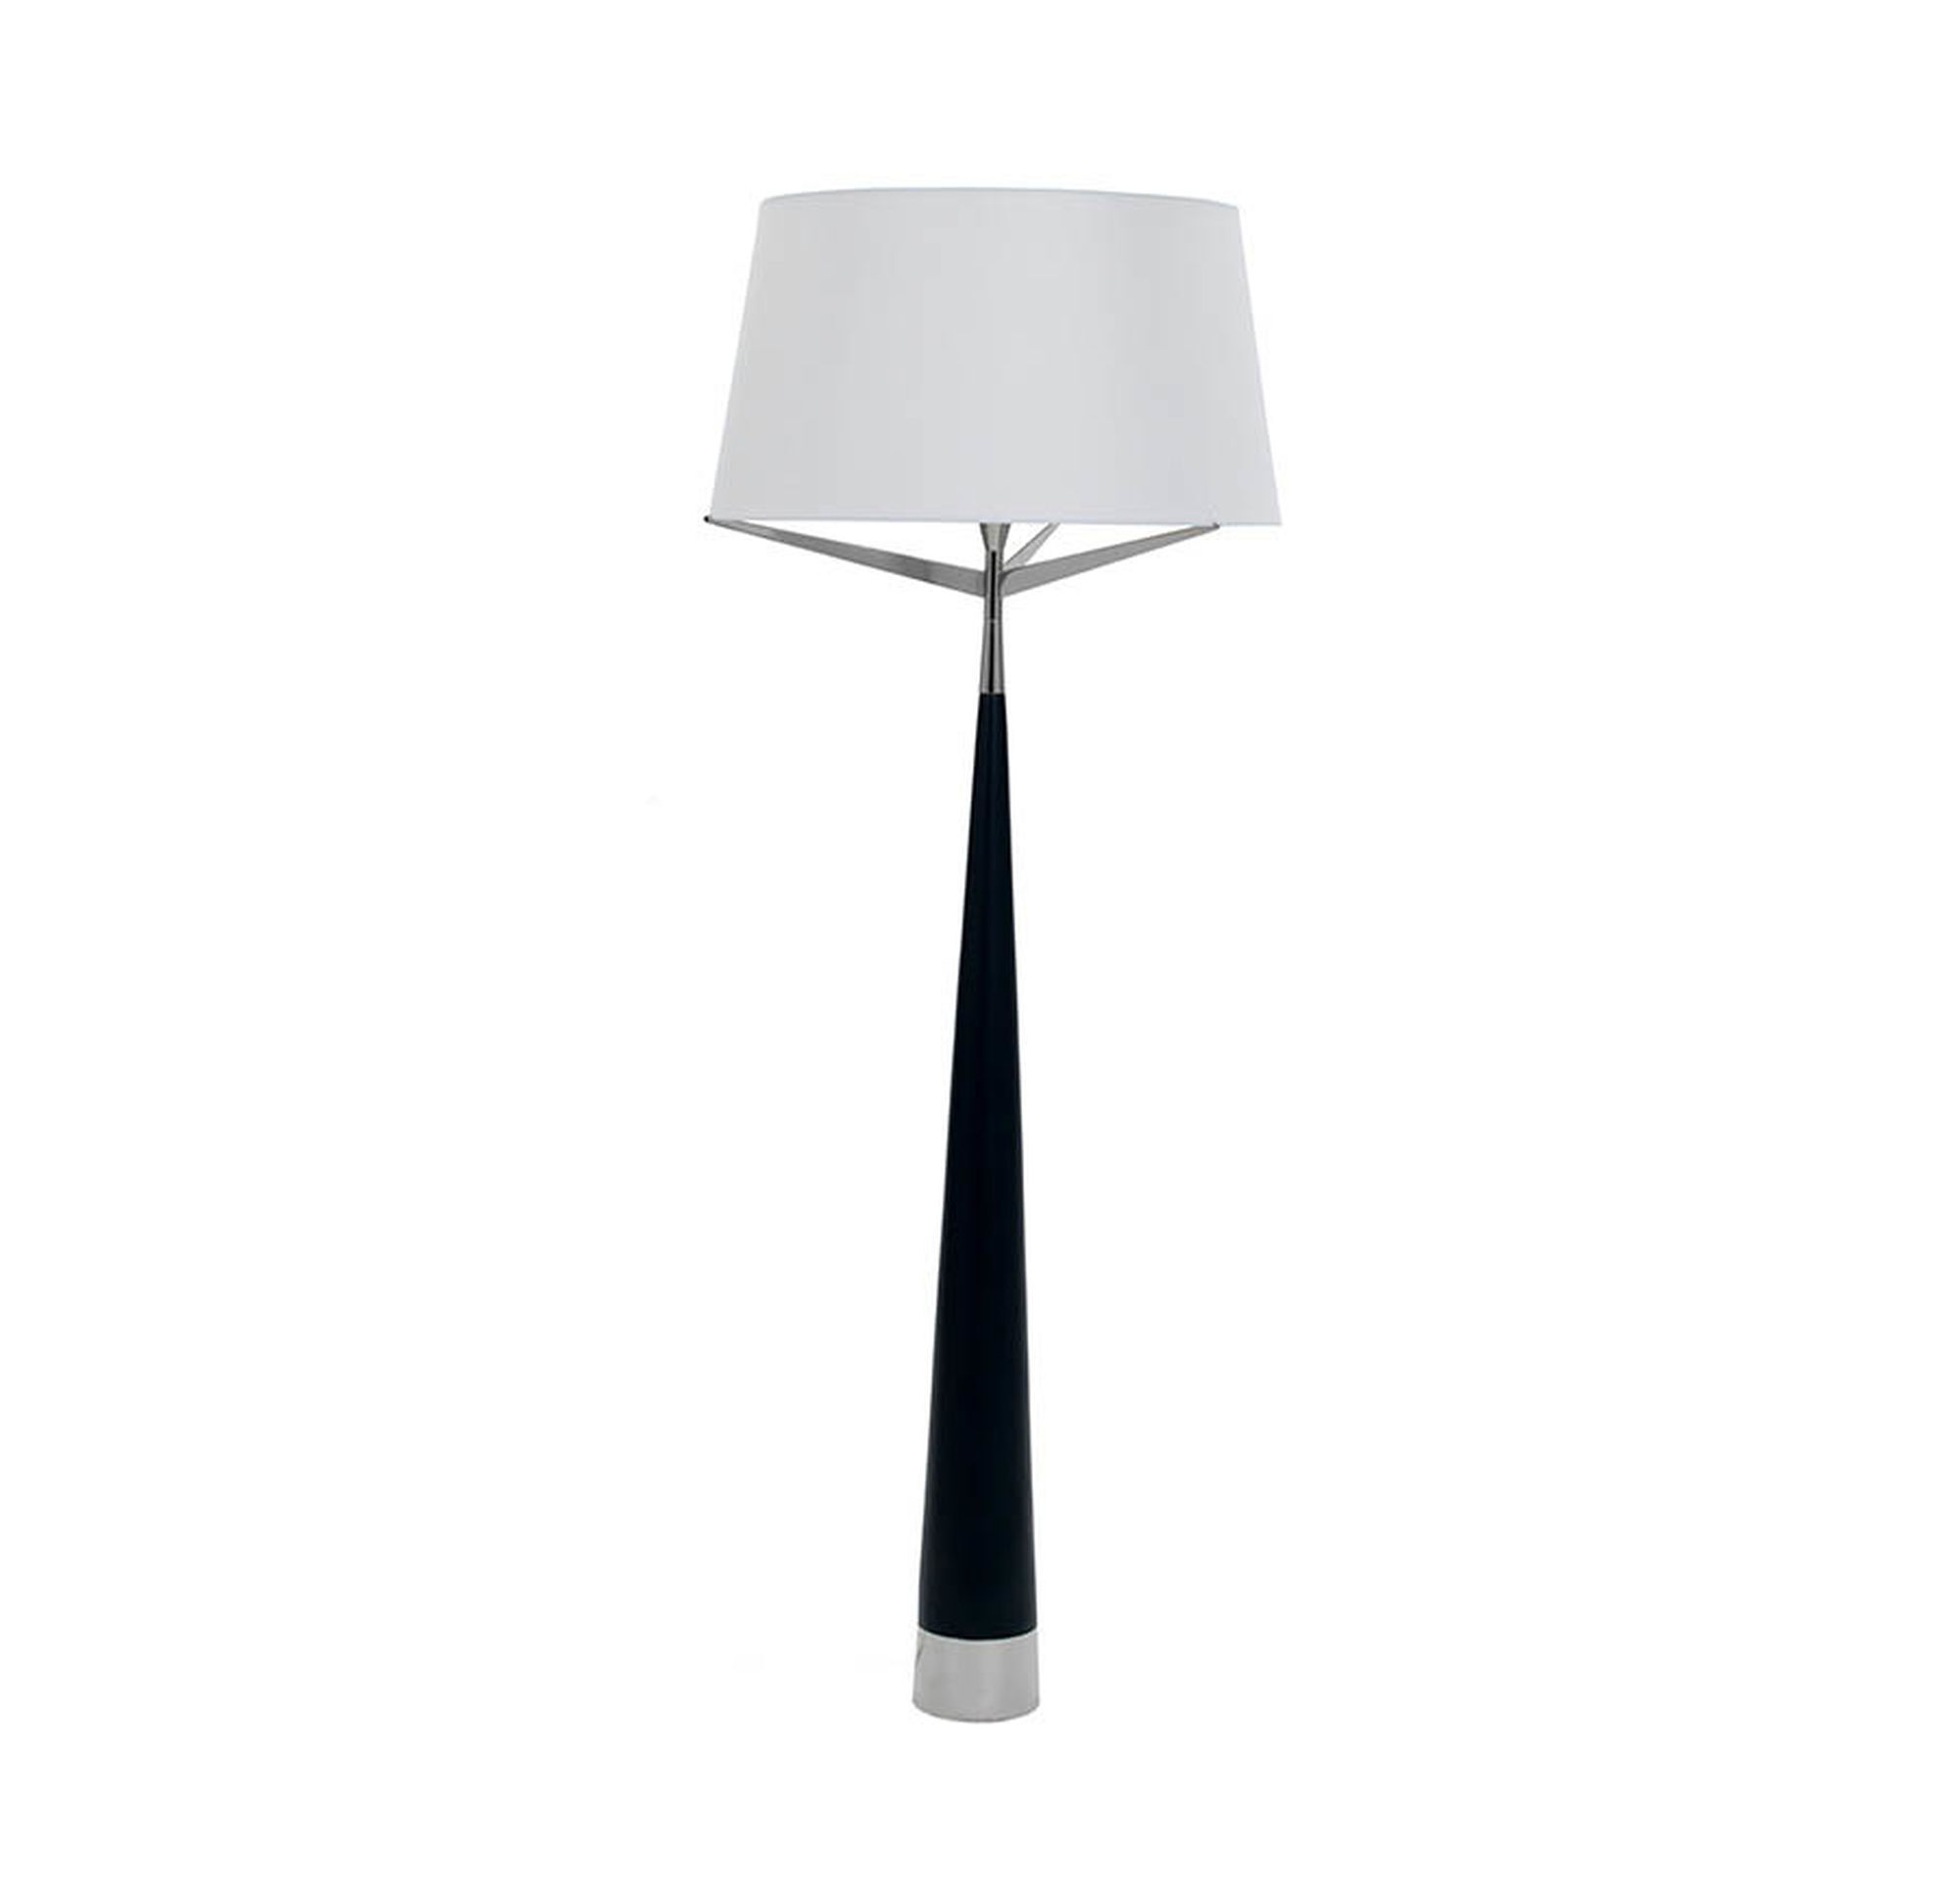 Luca floor lamp nickel luca floor lamp nickel hi res aloadofball Gallery